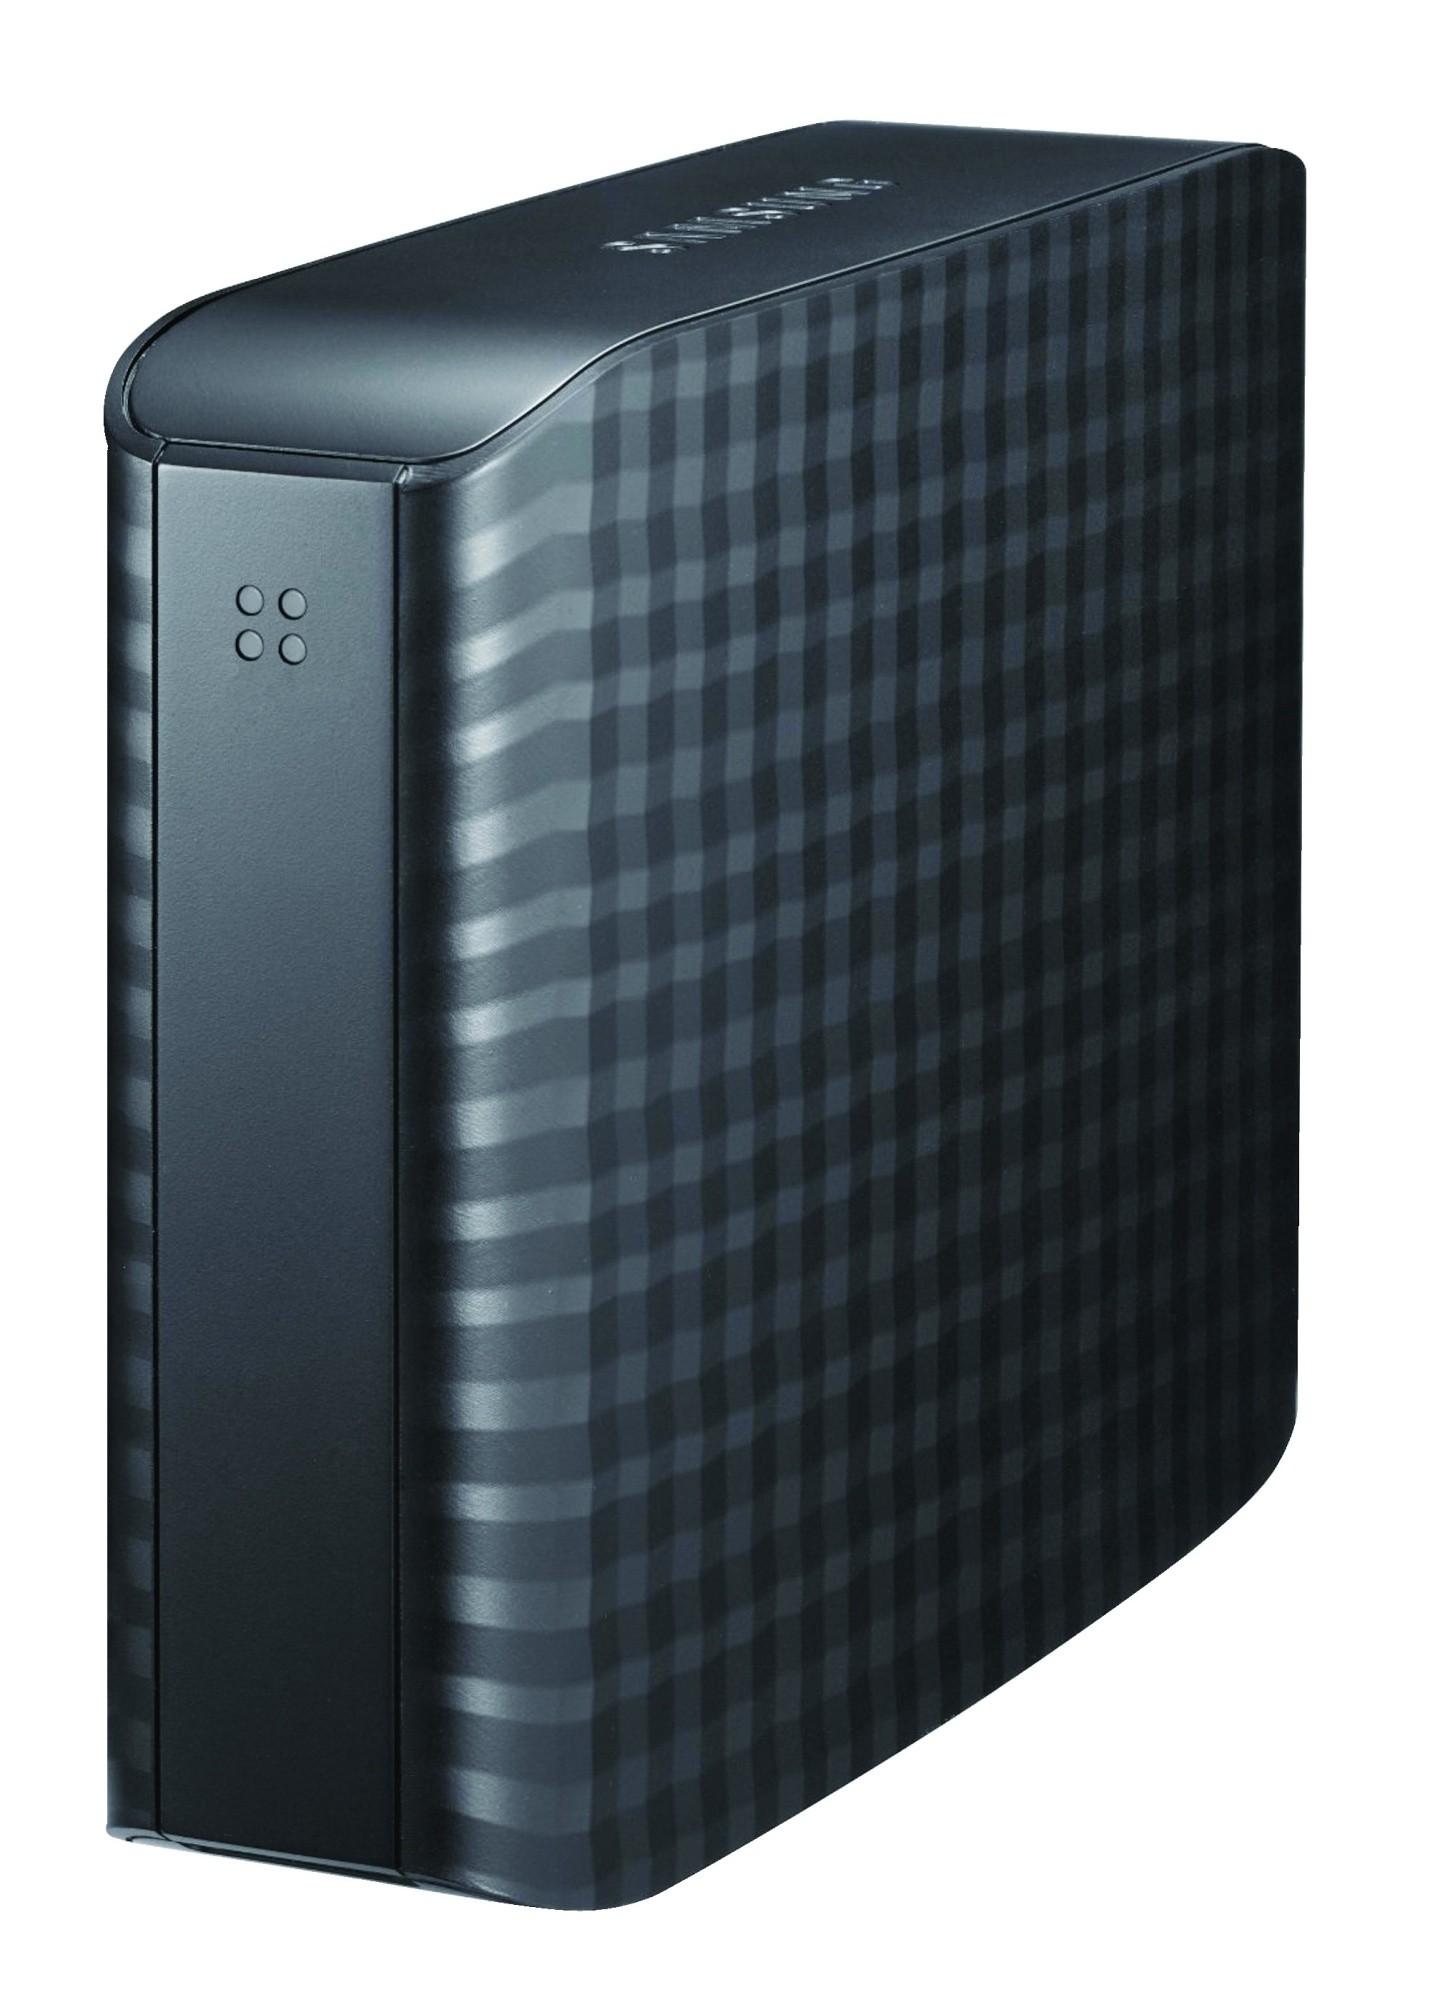 Samsung 3tb d3 desktop external hard drive compact size for 3tb esterno